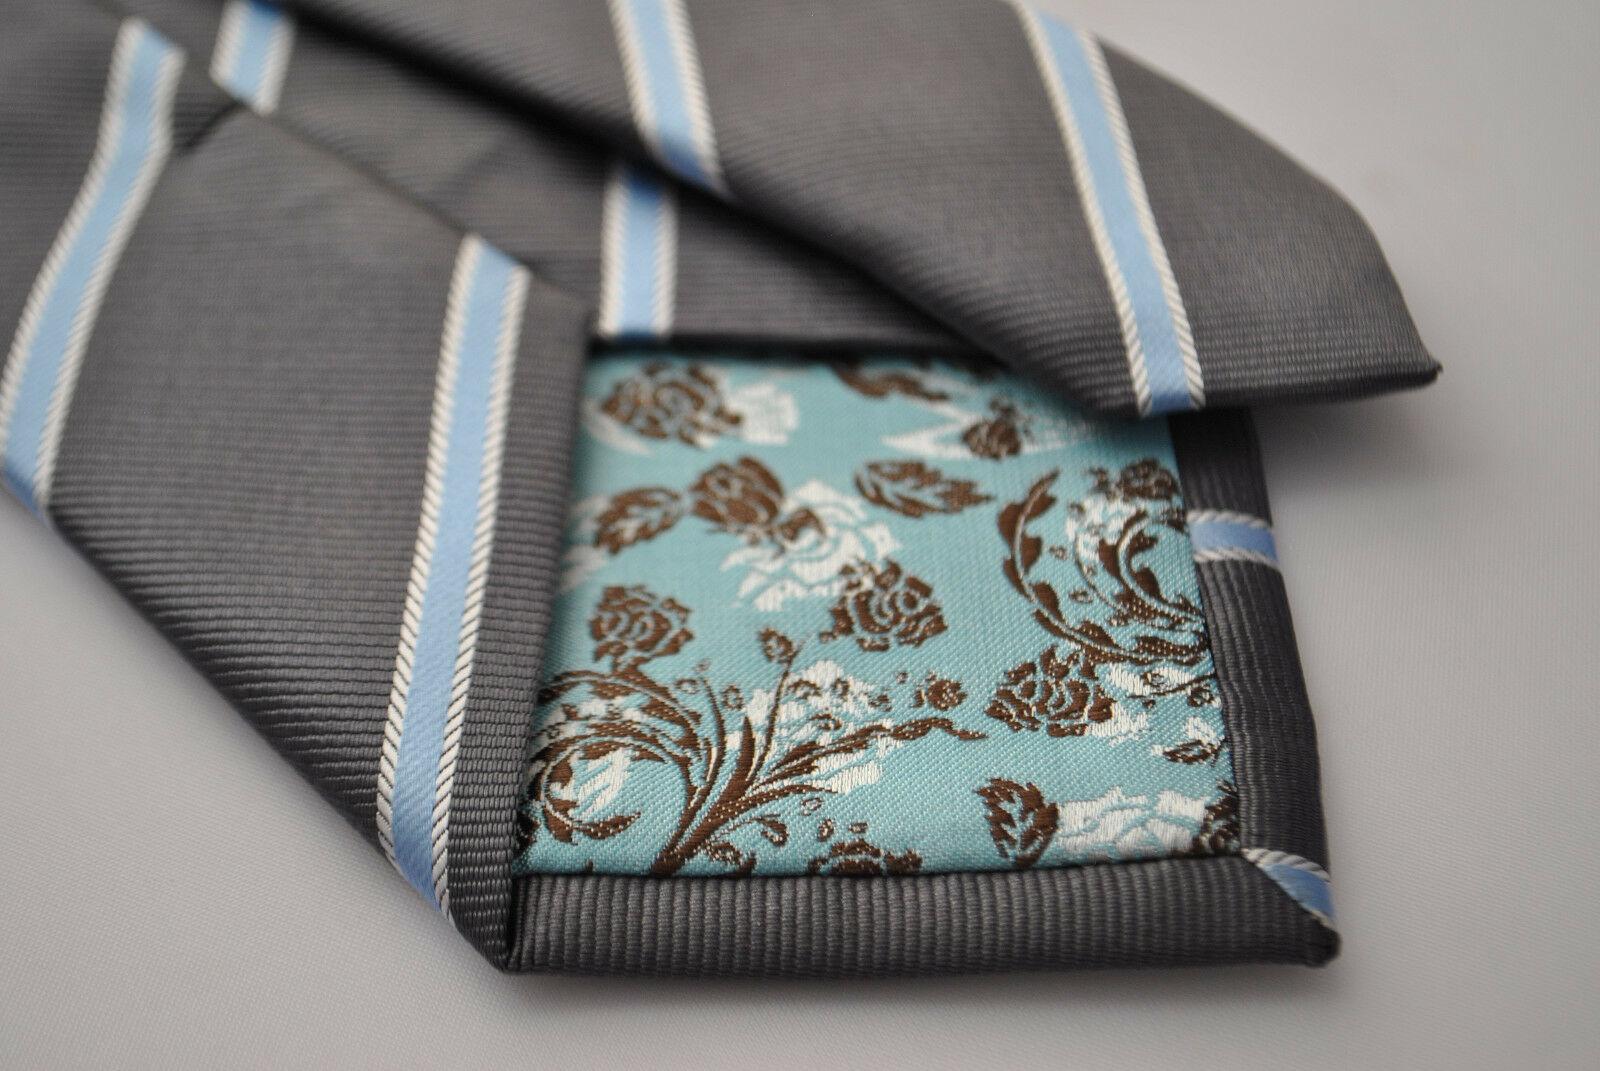 Frederick Thomas men's grey and light blue club striped tie FT1777